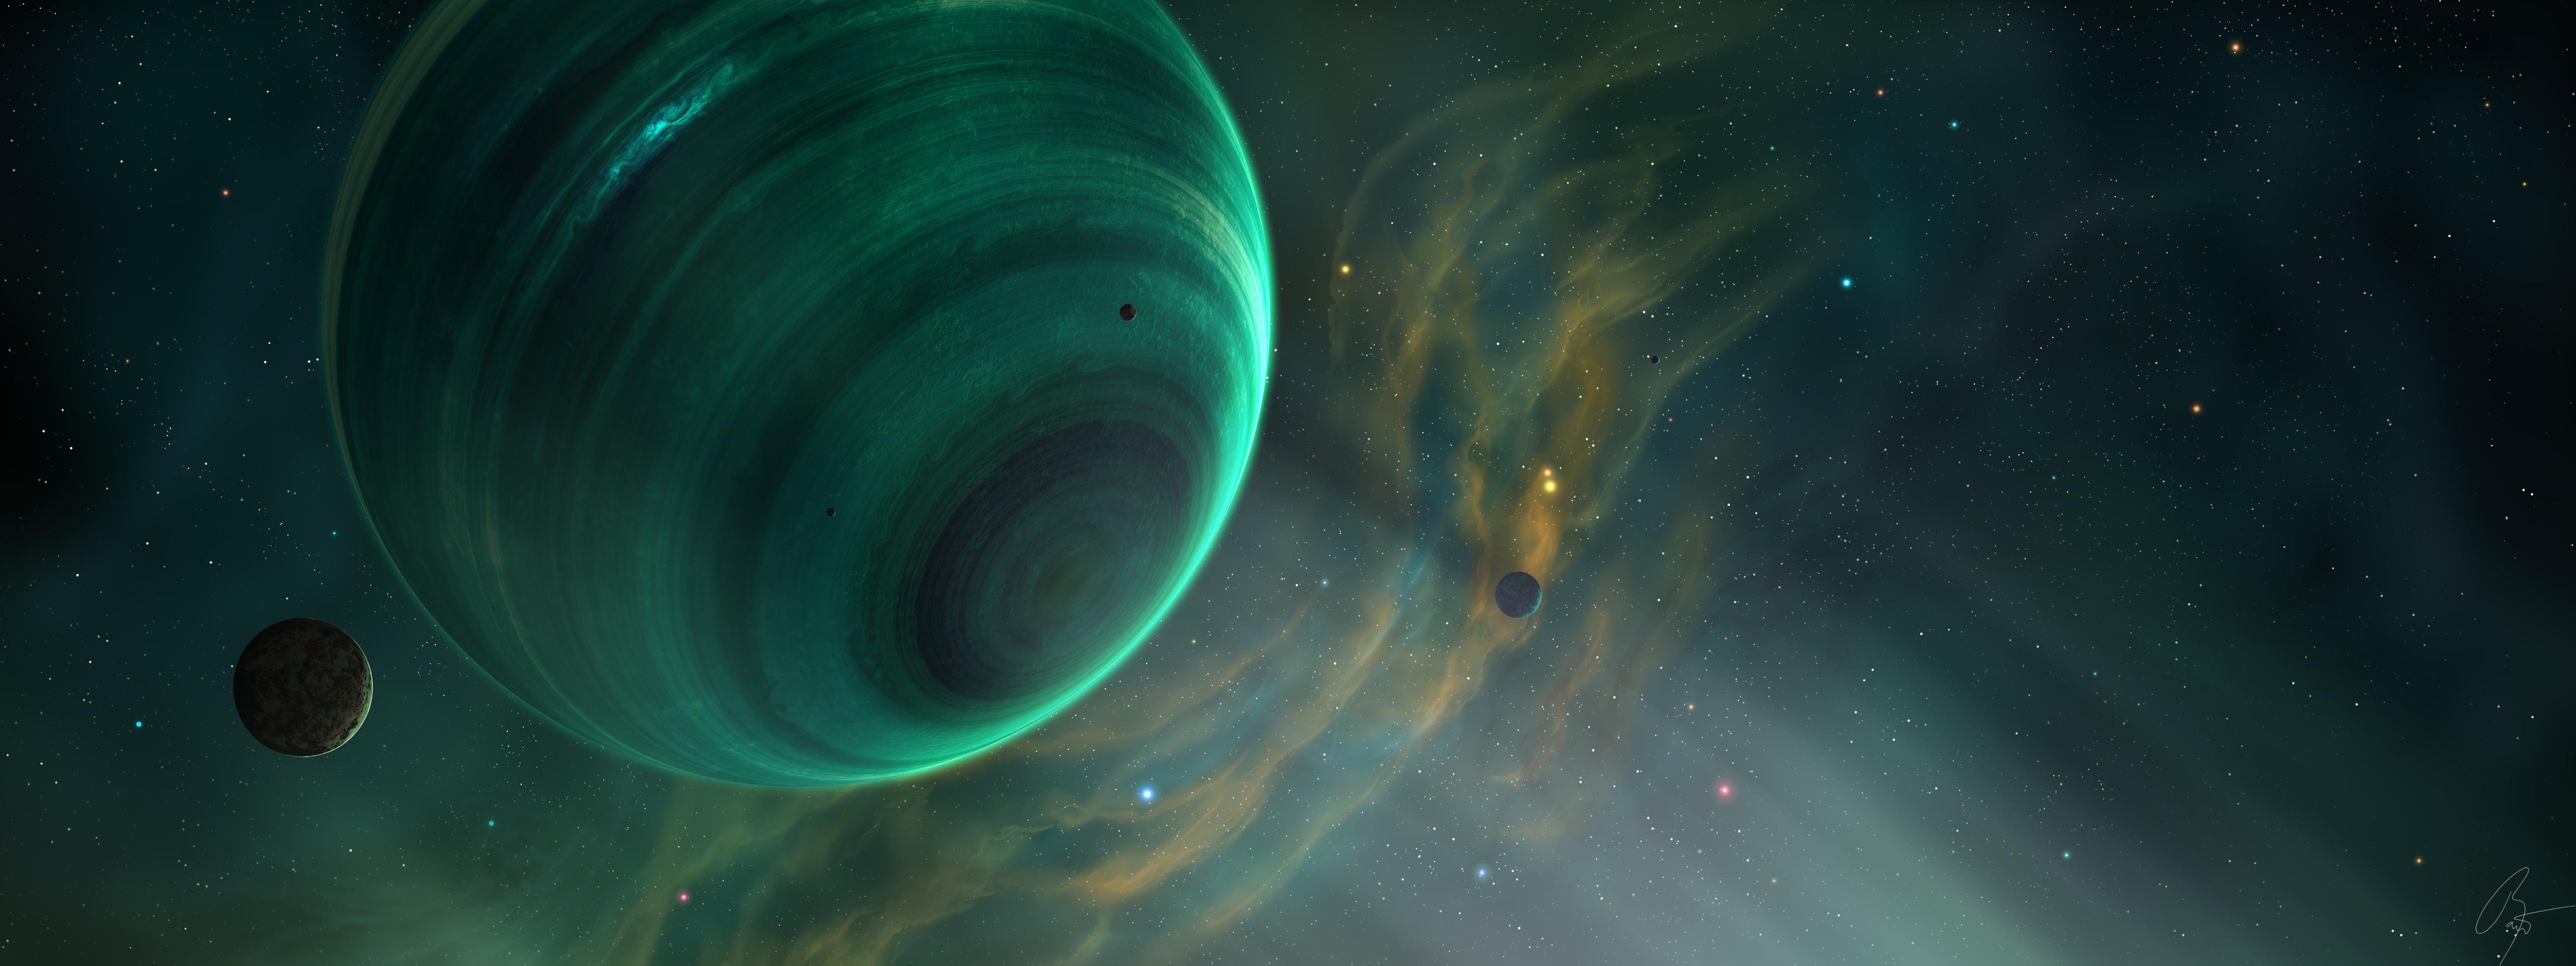 General 5120x1920 space art planet space digital art JoeyJazz